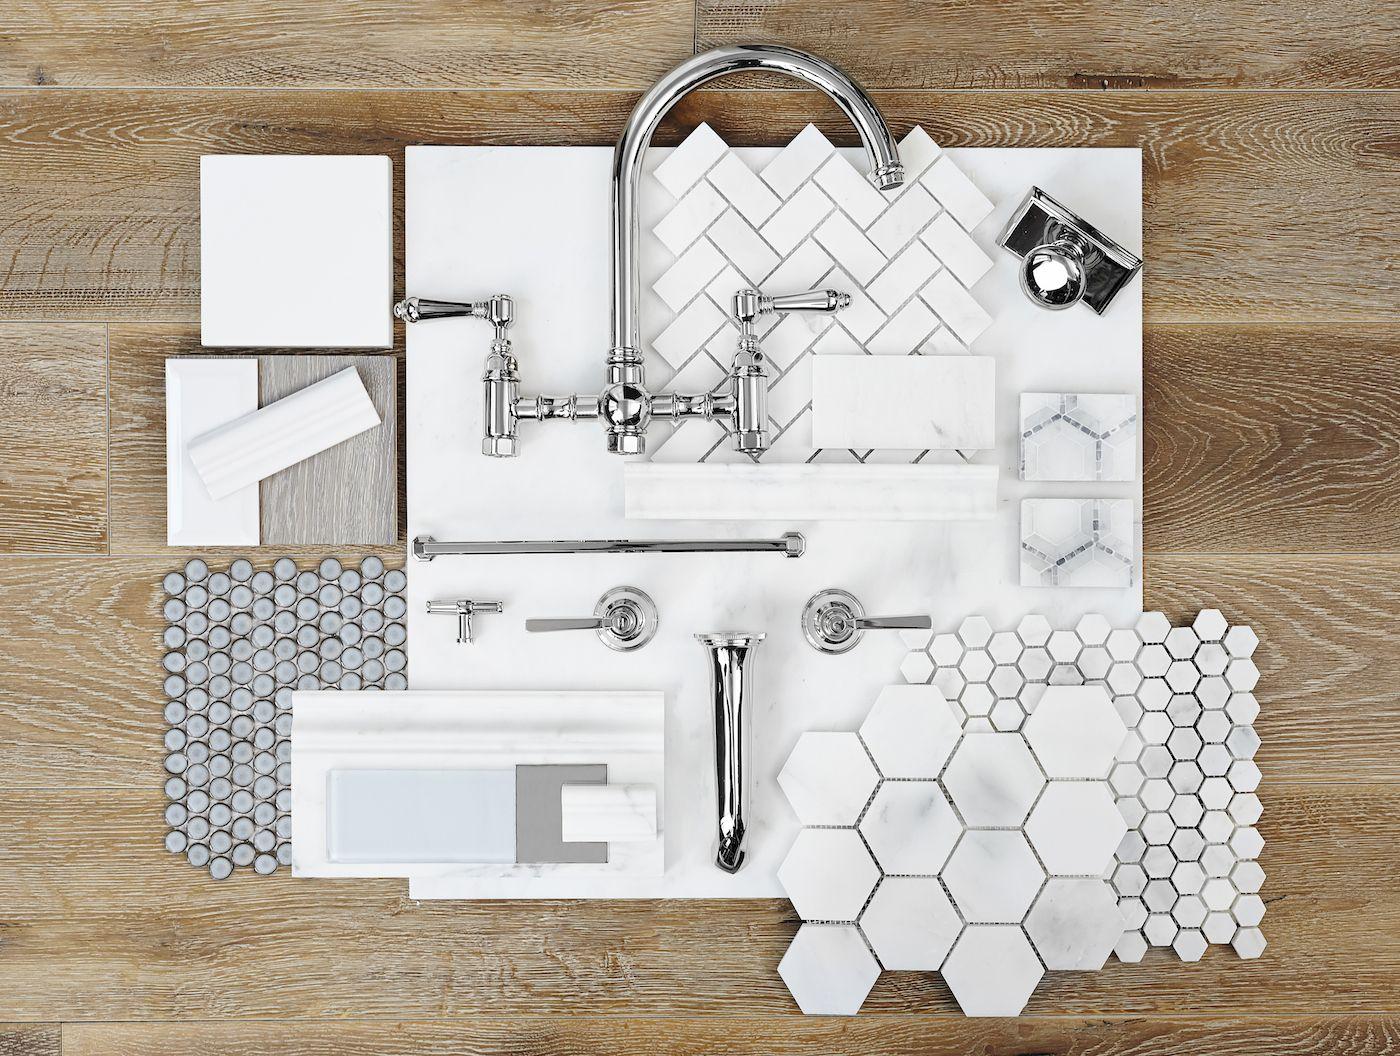 Interior Finishes By Carlyle Designs Wwwbarnandvinehomescom - Interior design materials